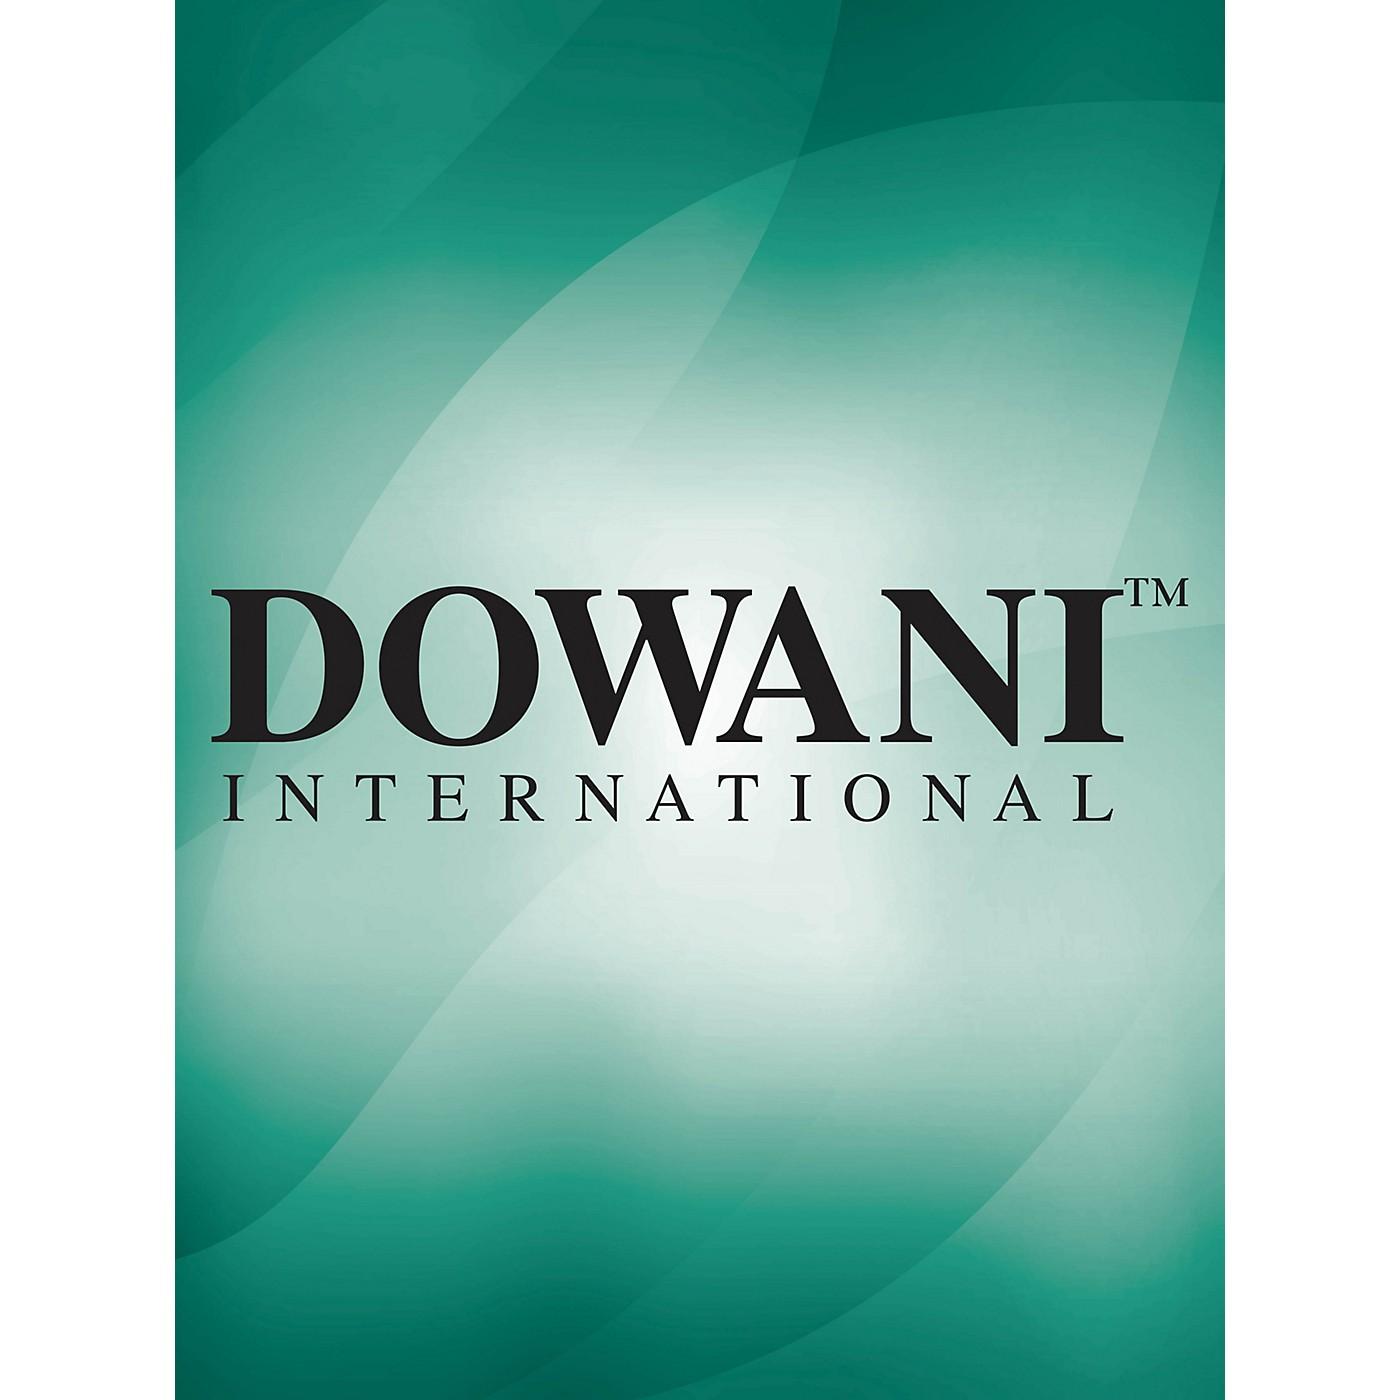 Hal Leonard Concerto For Cello & Orch (pno Reduct) Rv399 C Major Bk/d Dowani Book/CD Series by Antonio Vivaldi thumbnail